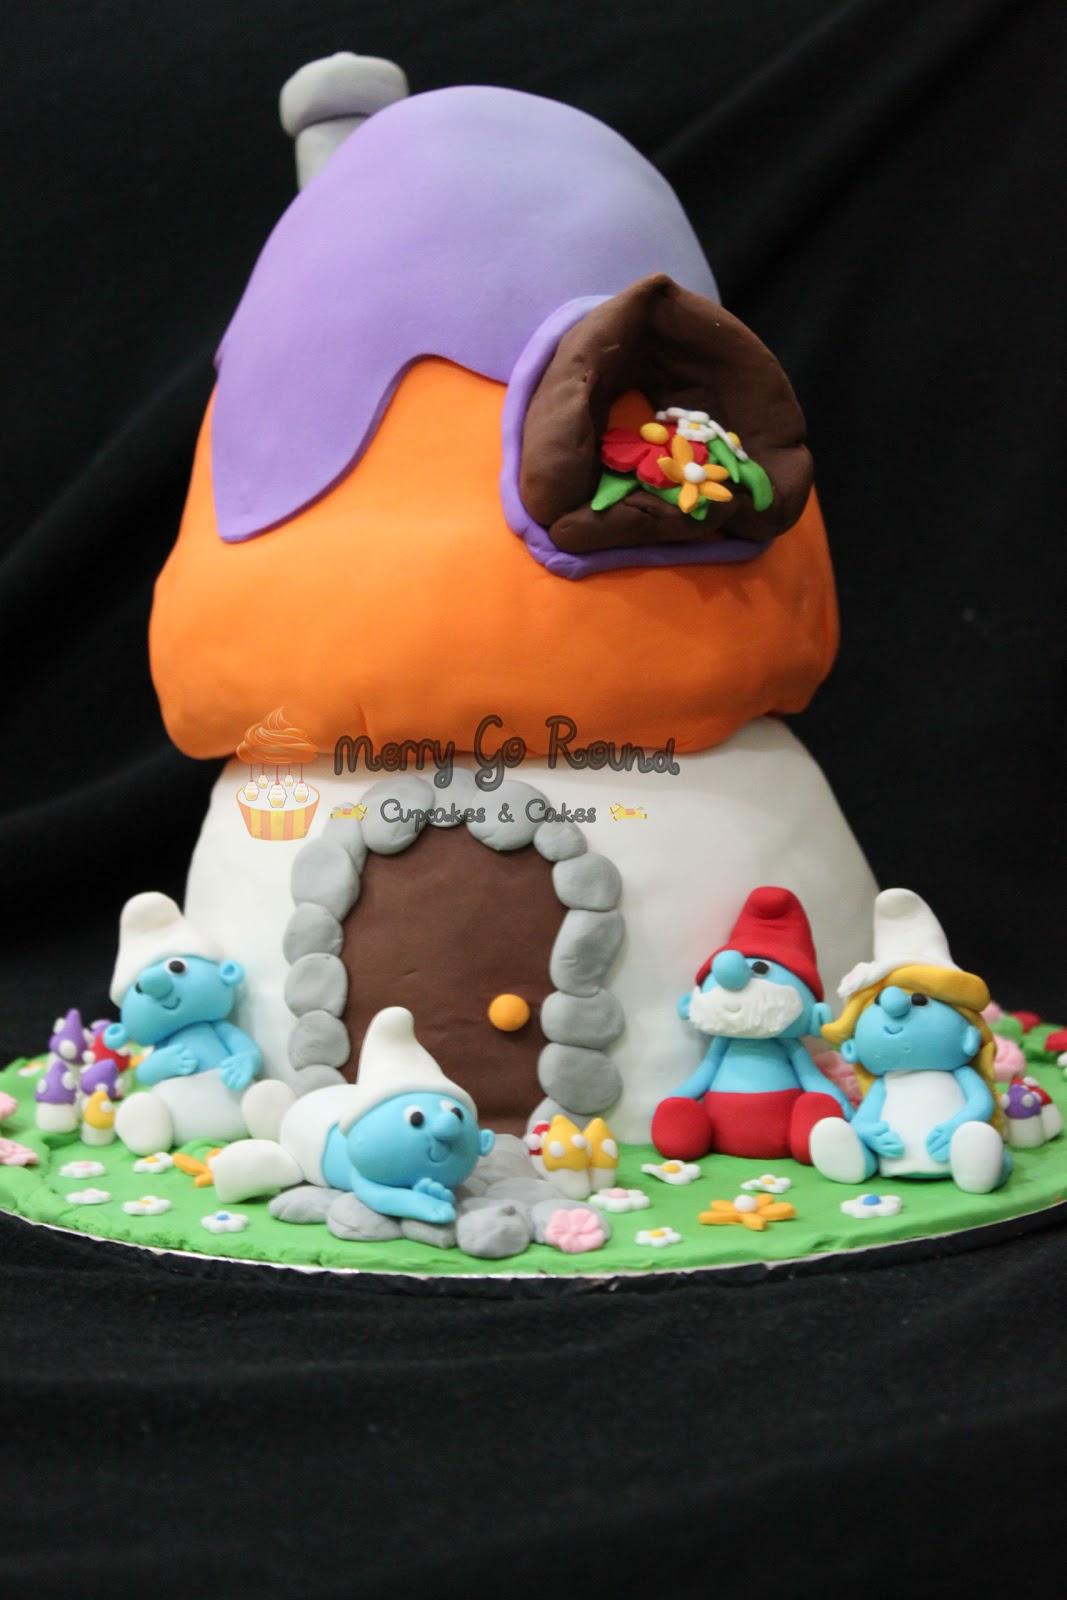 Merry Go Round Cupcakes Cakes Birthday Cake Smurf House Theme